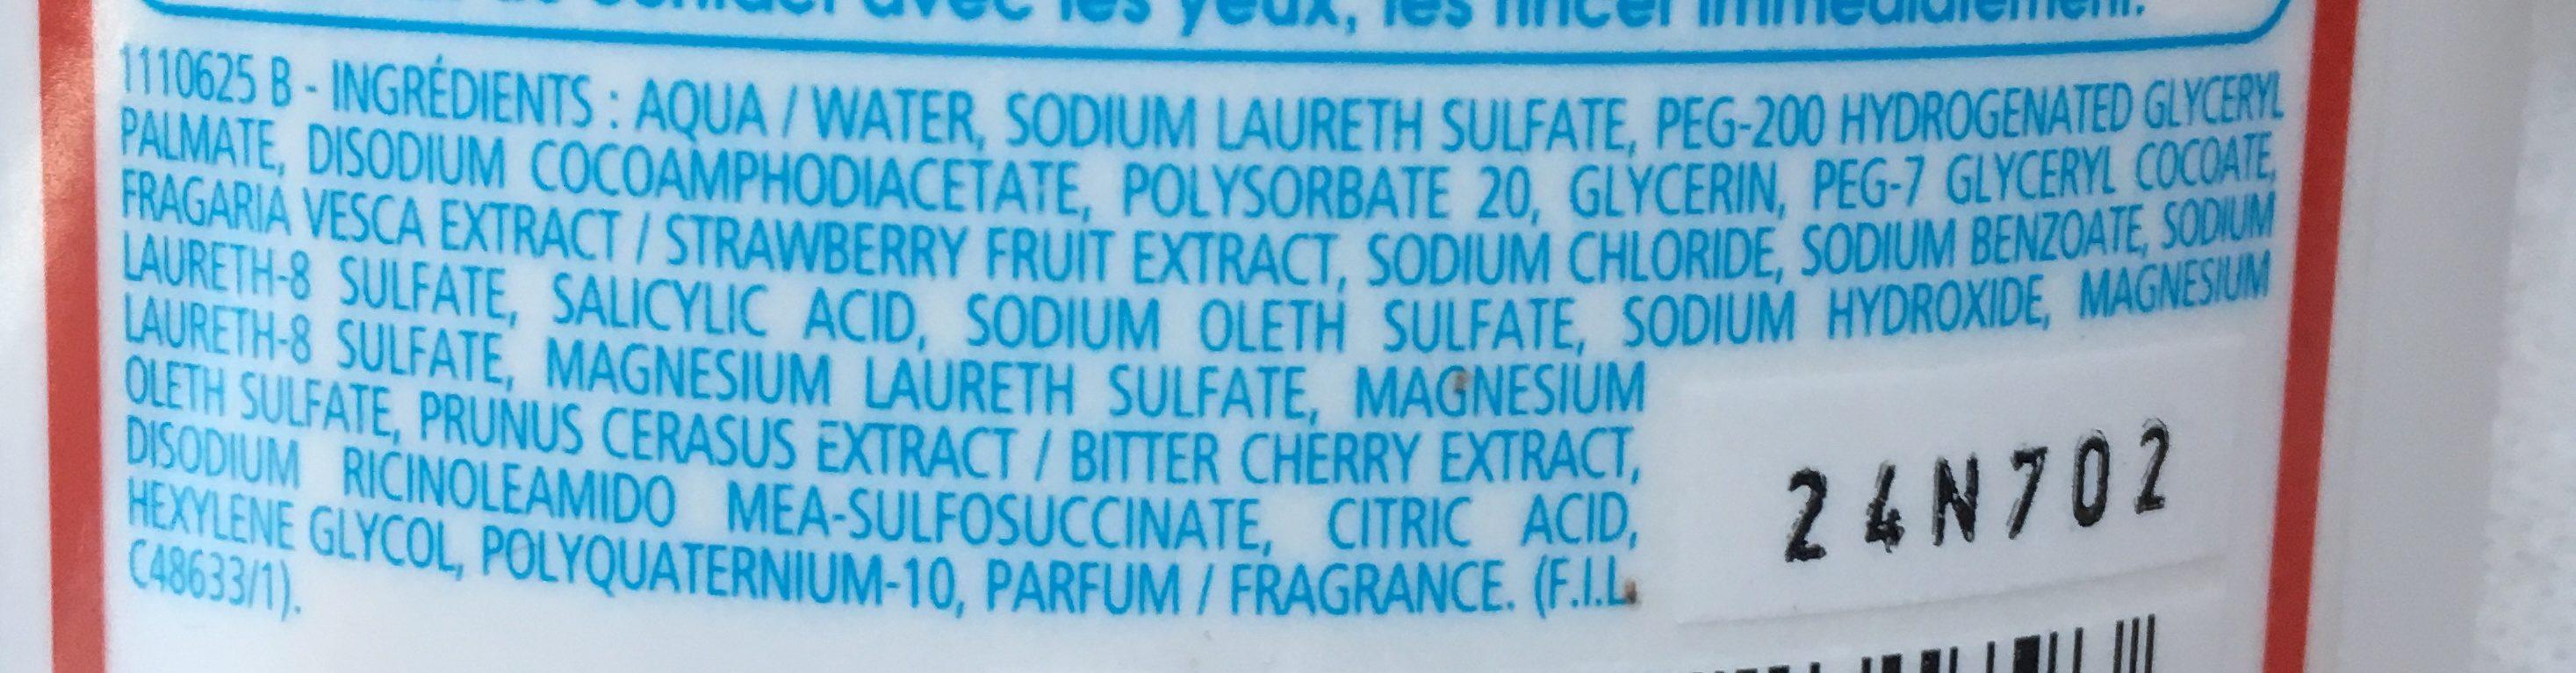 Shampooing 2 en 1 ultra démêlant, Fraise-cerise - Ingredients - fr